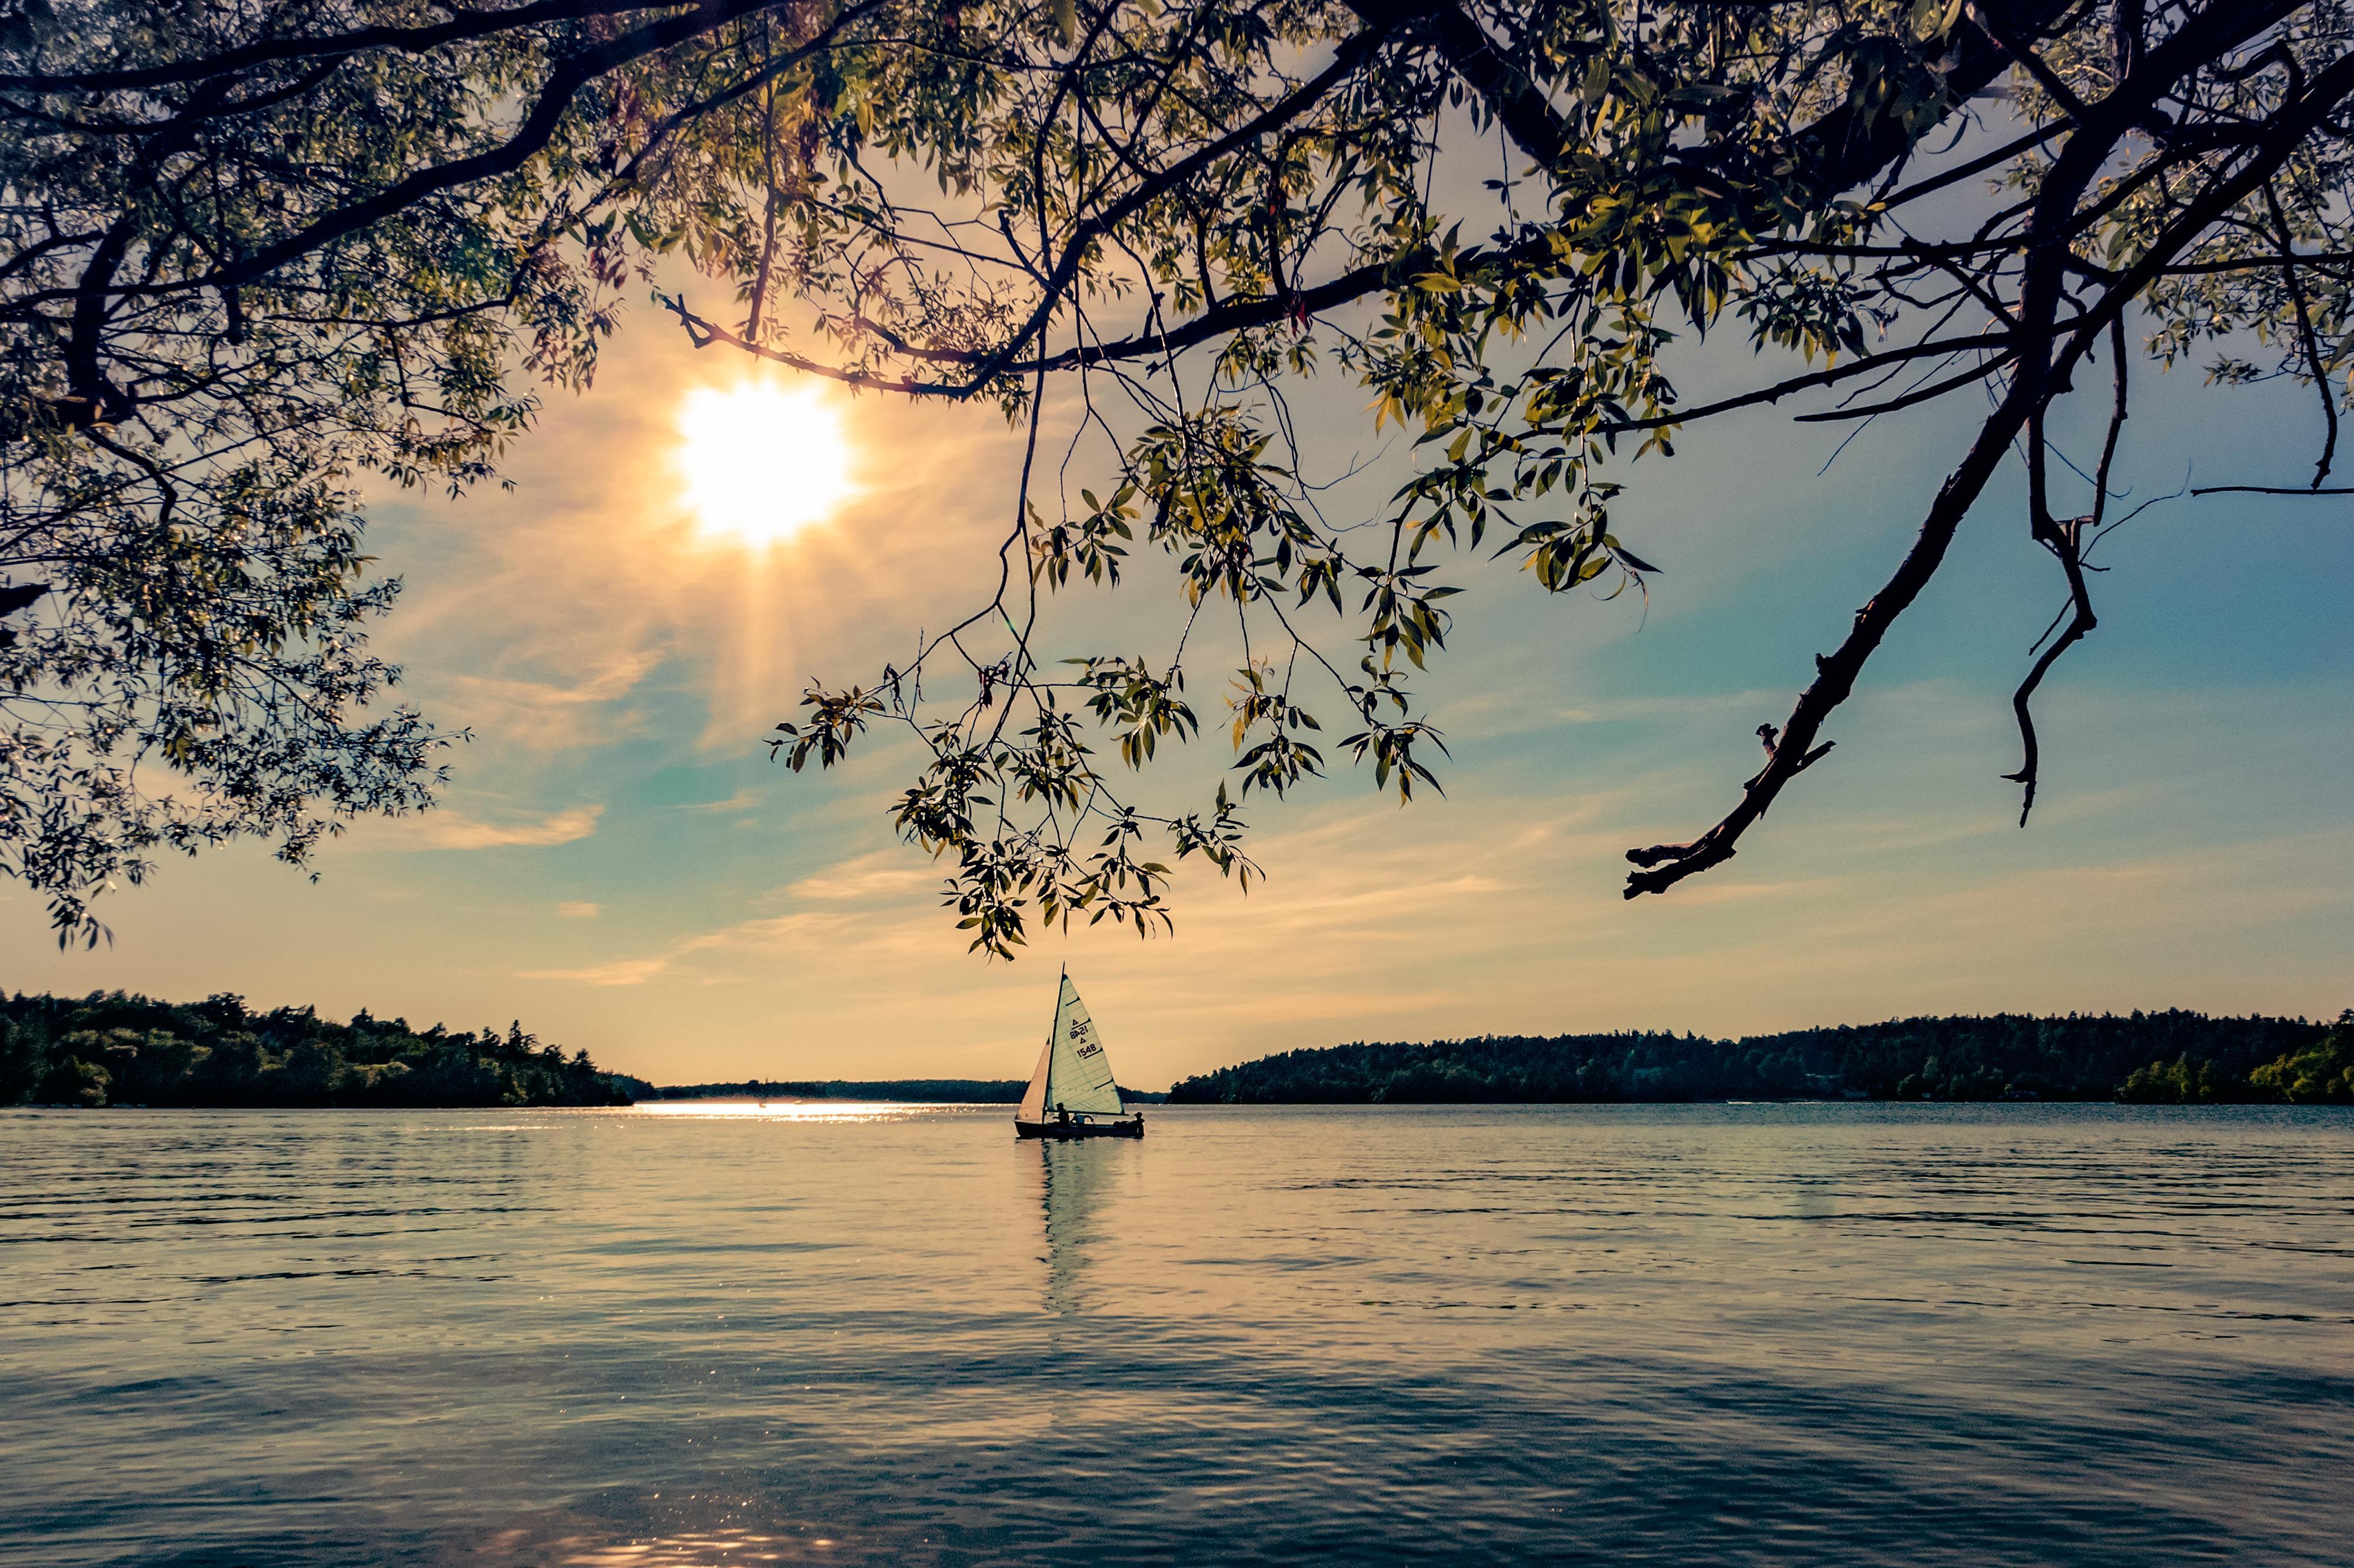 Обои озеро, лодка, парусник, ветки деревьев